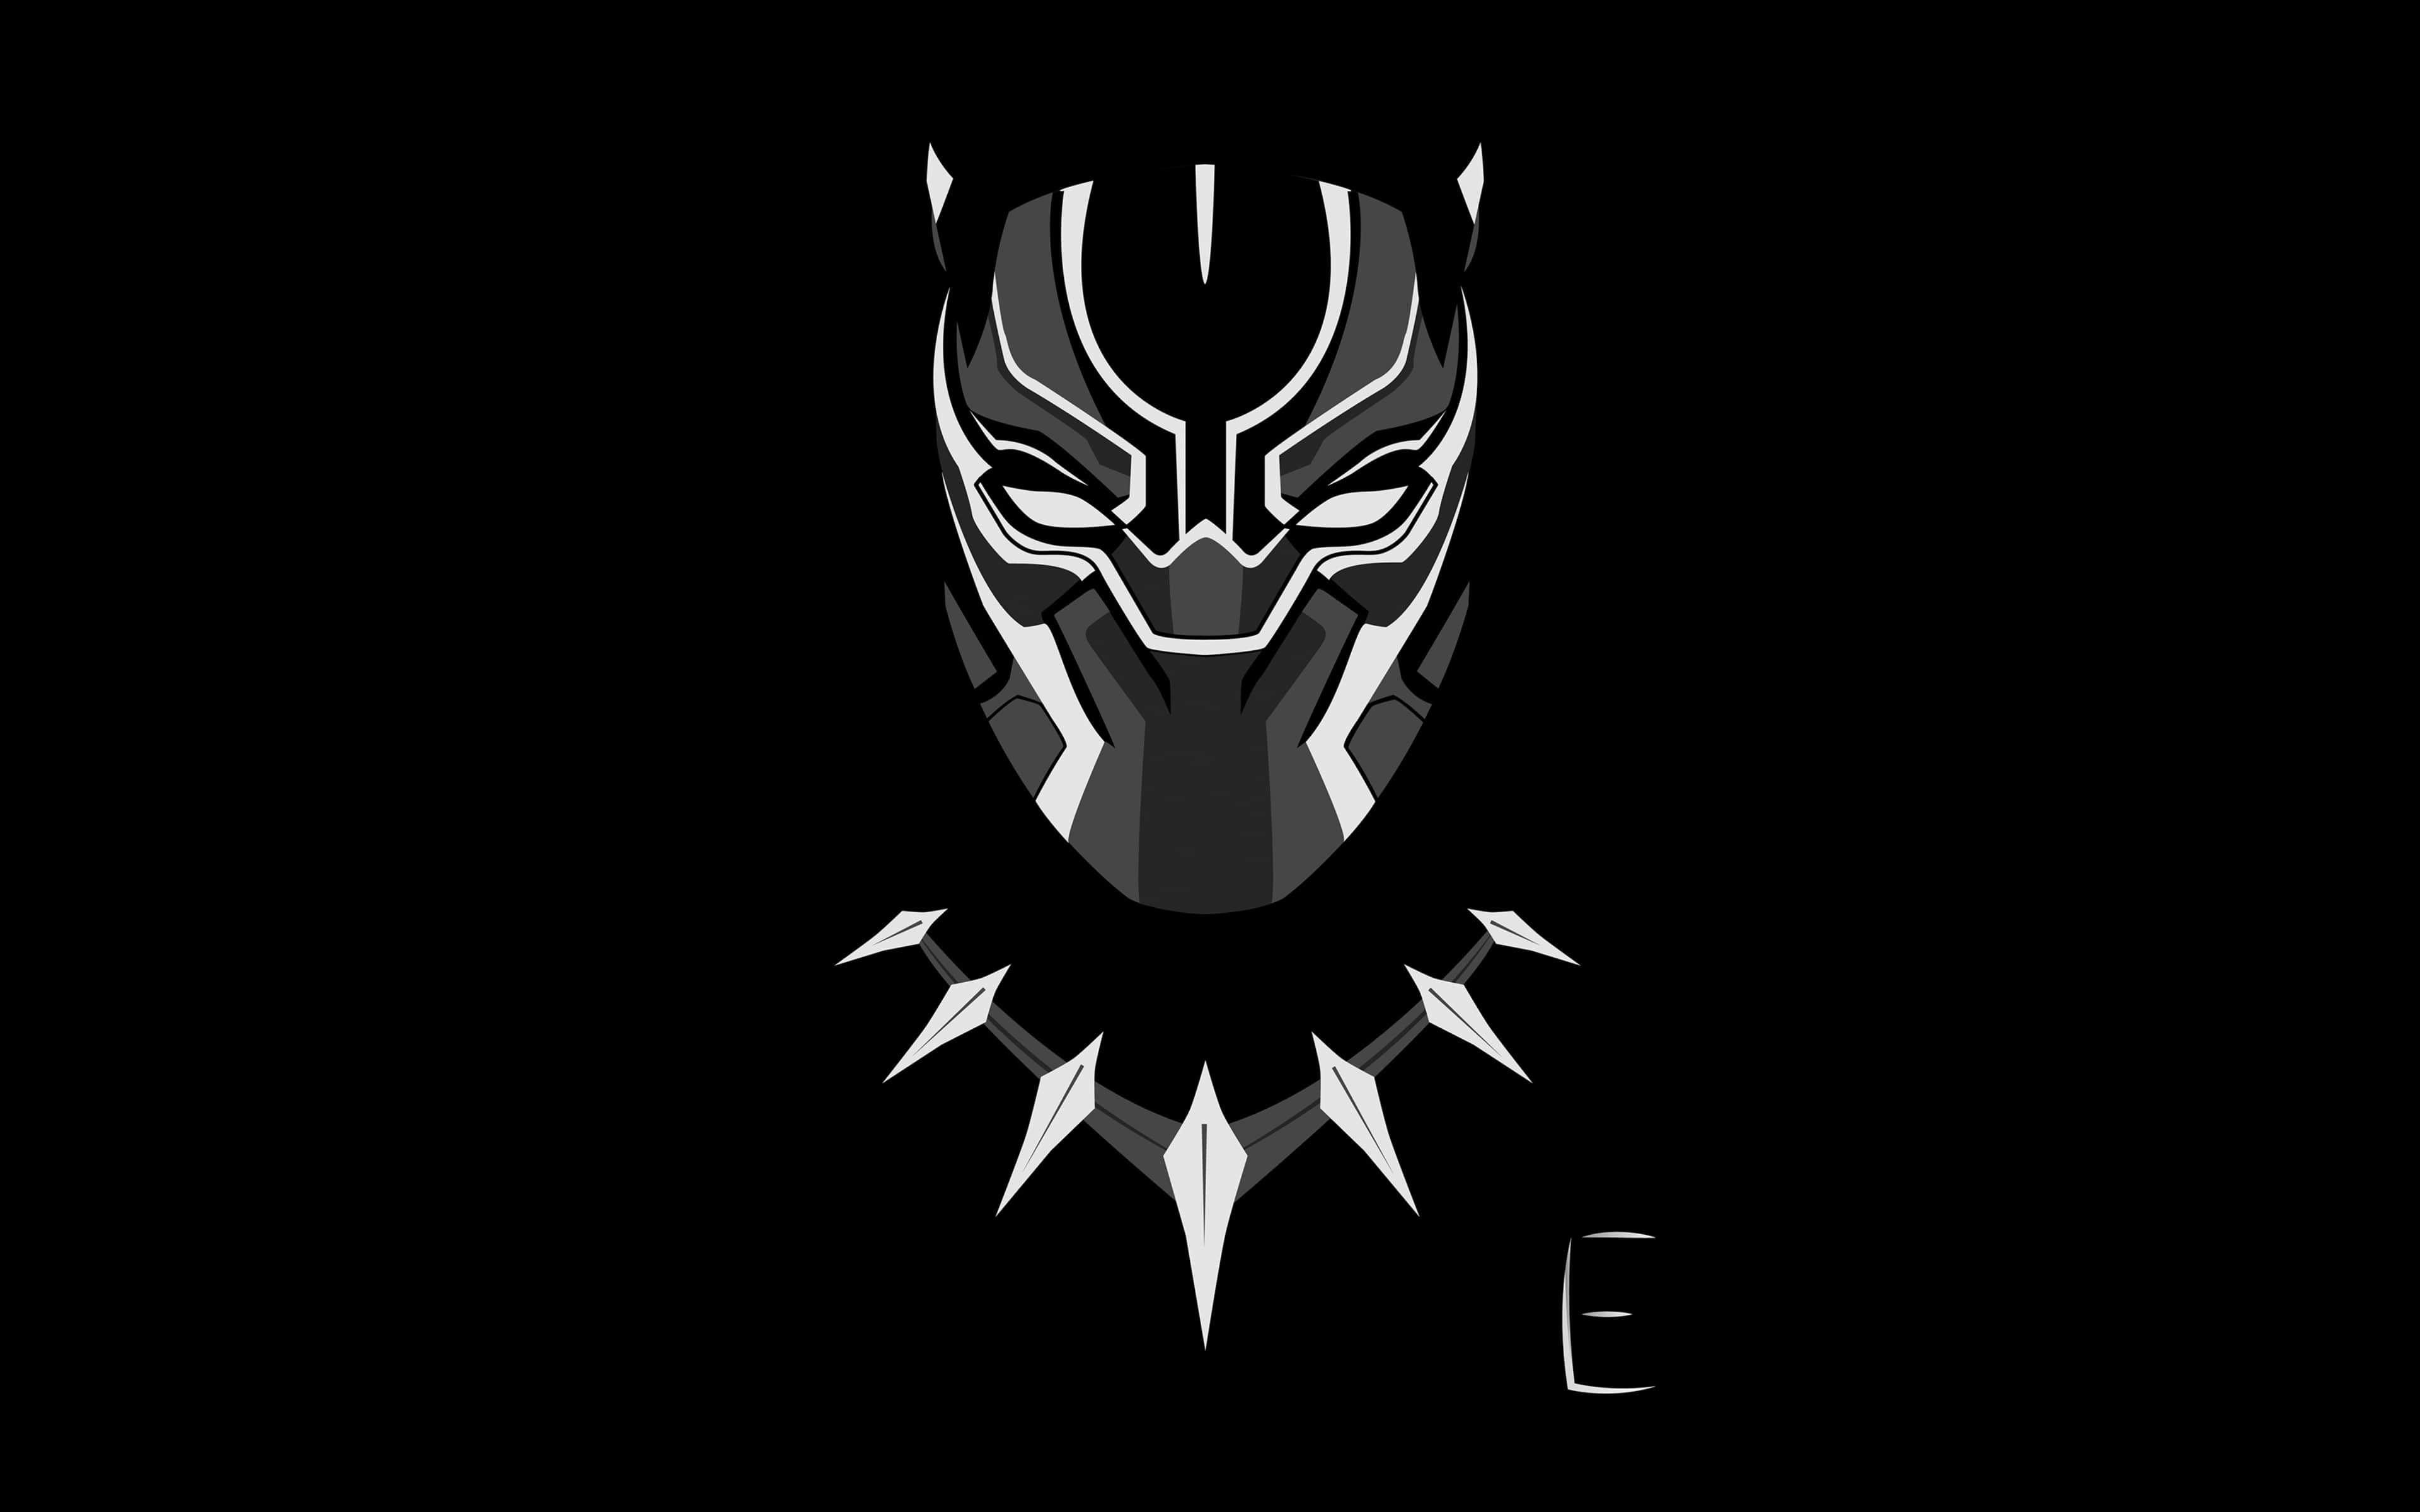 Black Panther Minimalism Desktop Wallpaper Black Marvel